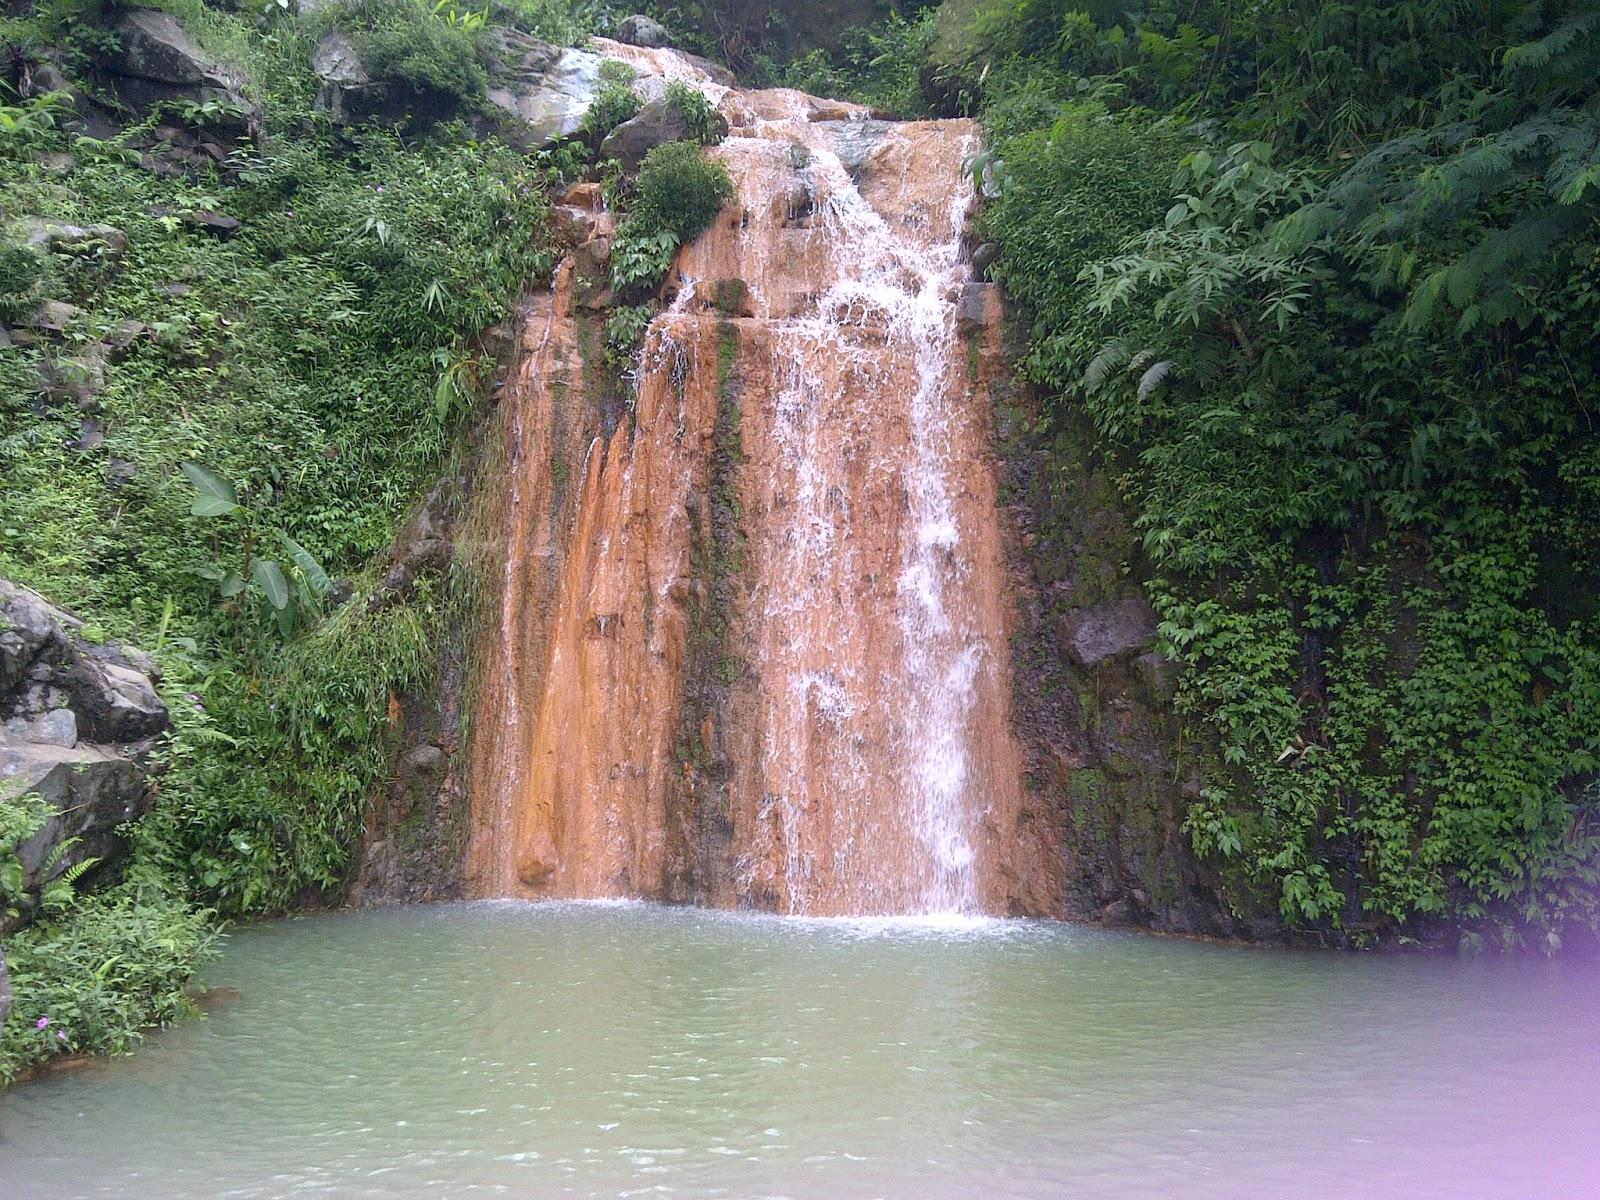 Air Terjun Klenting Kuning Keunikan Air Terjun Berwarna Kuning di Jawa Tengah